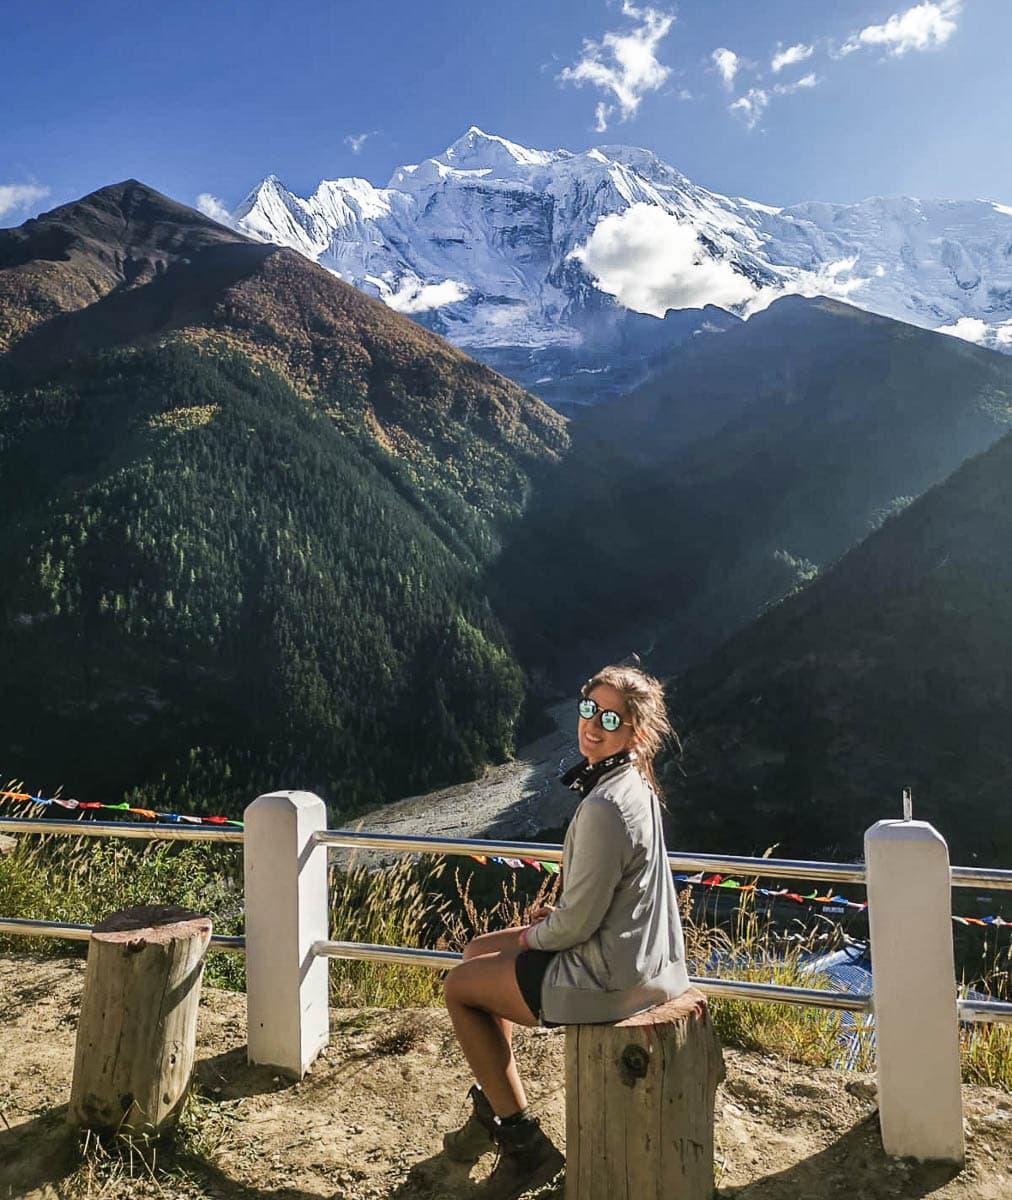 Ciekawostki o Annapurna Circuit - Annapurna II